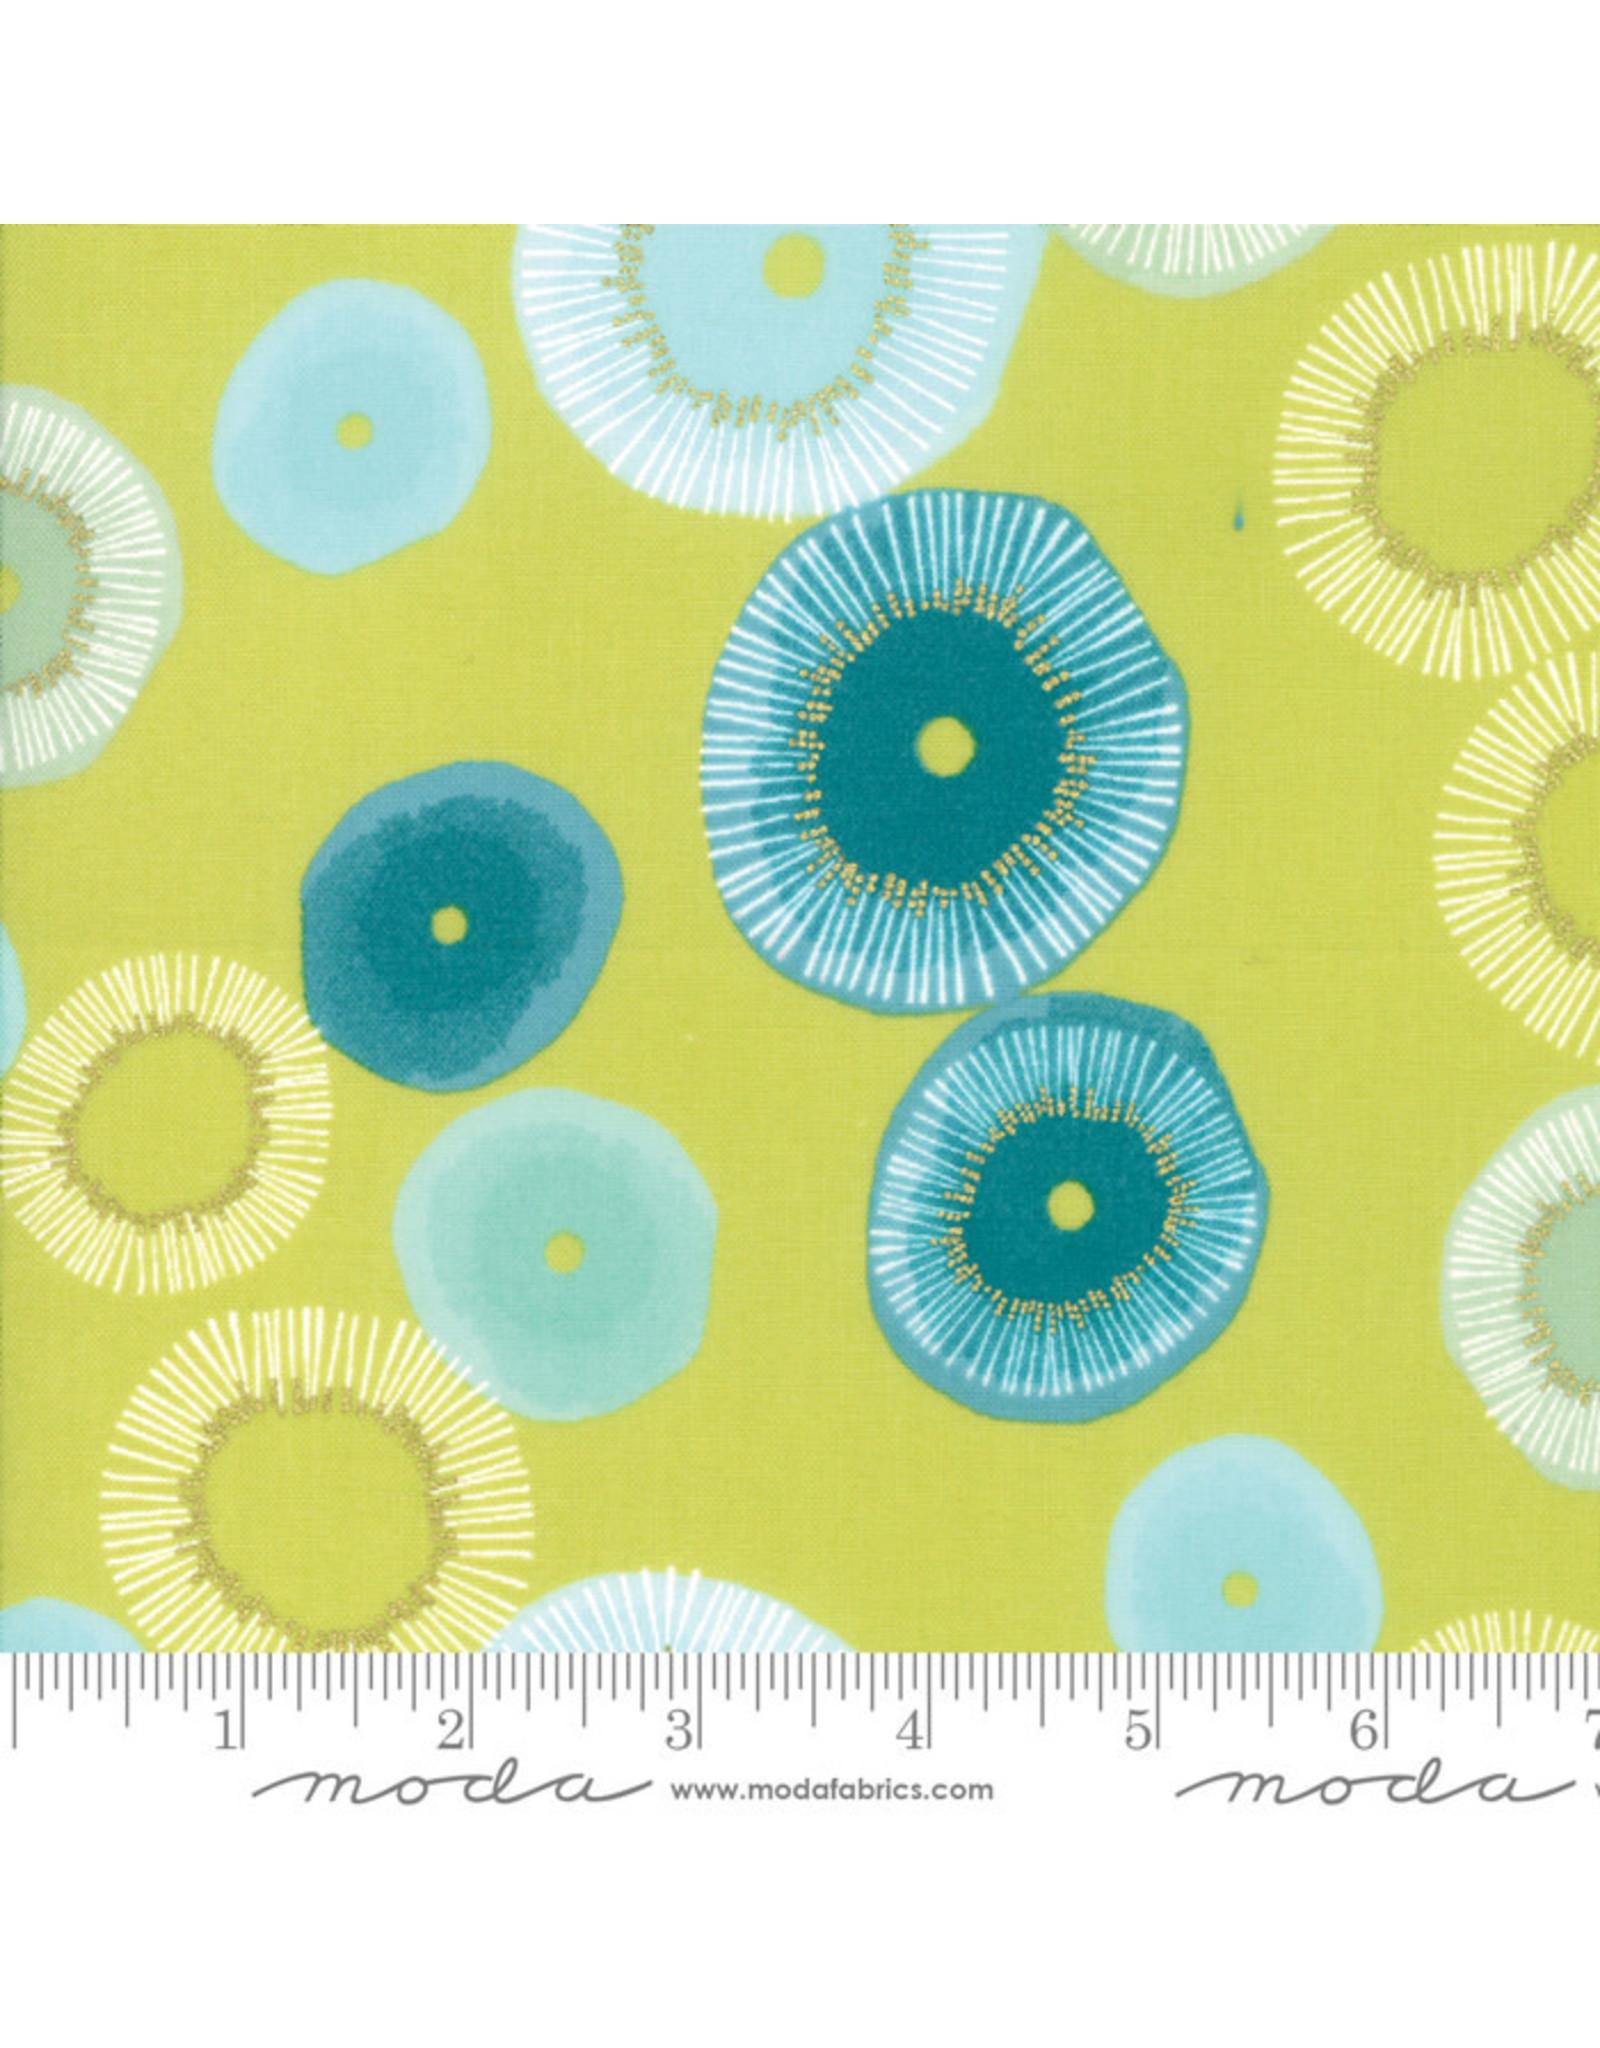 Moda Day in Paris - Blooming Light Green coupon (± 22 x 110 cm)